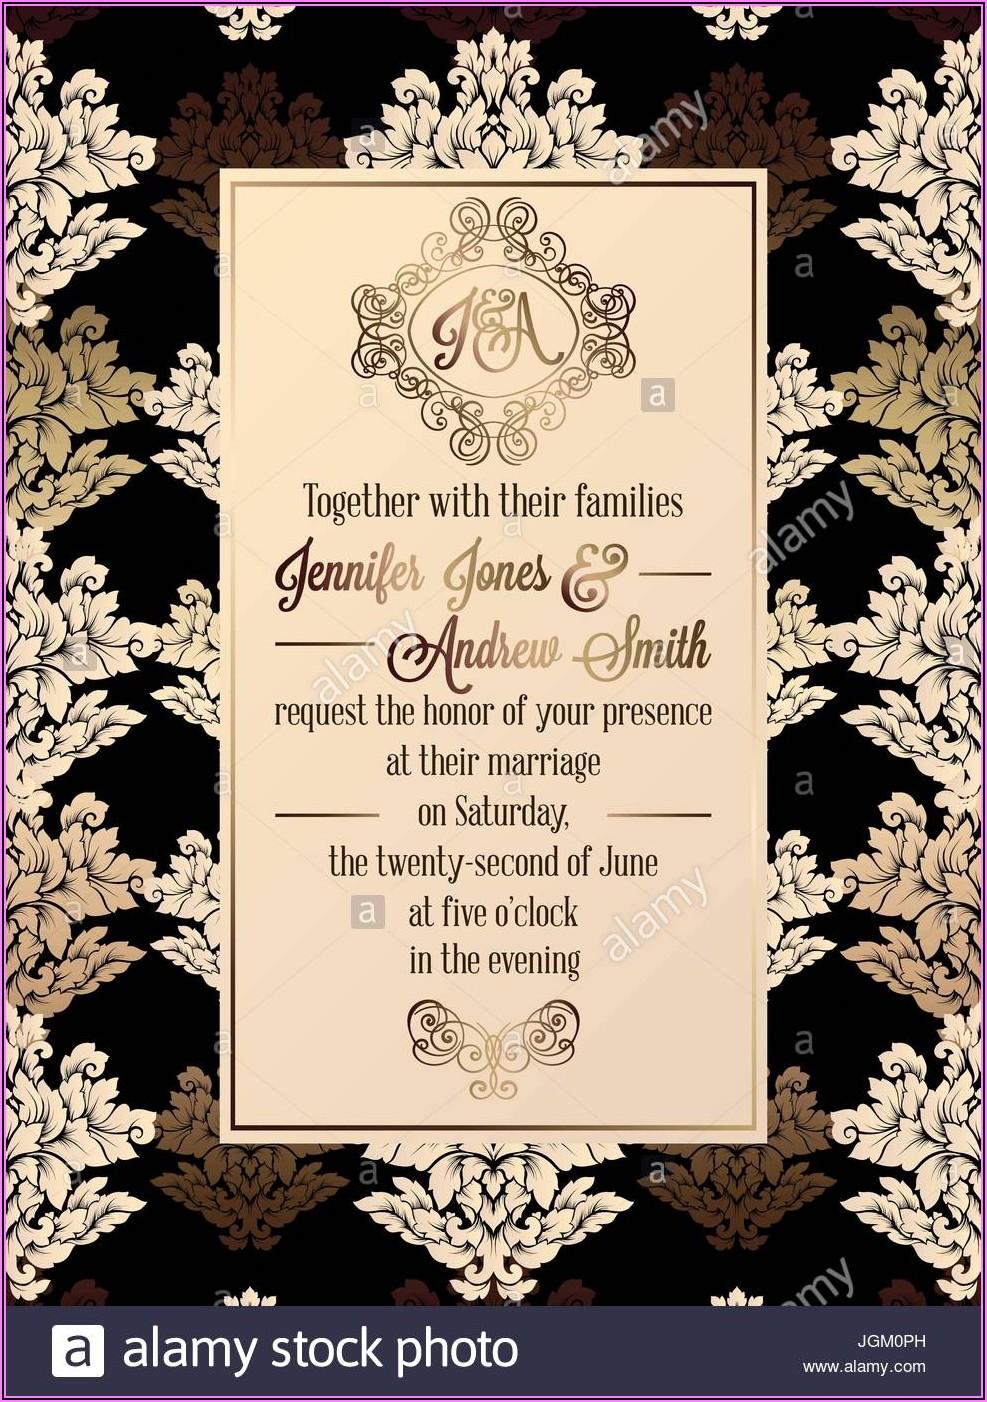 Formal Invitation Card Design Template